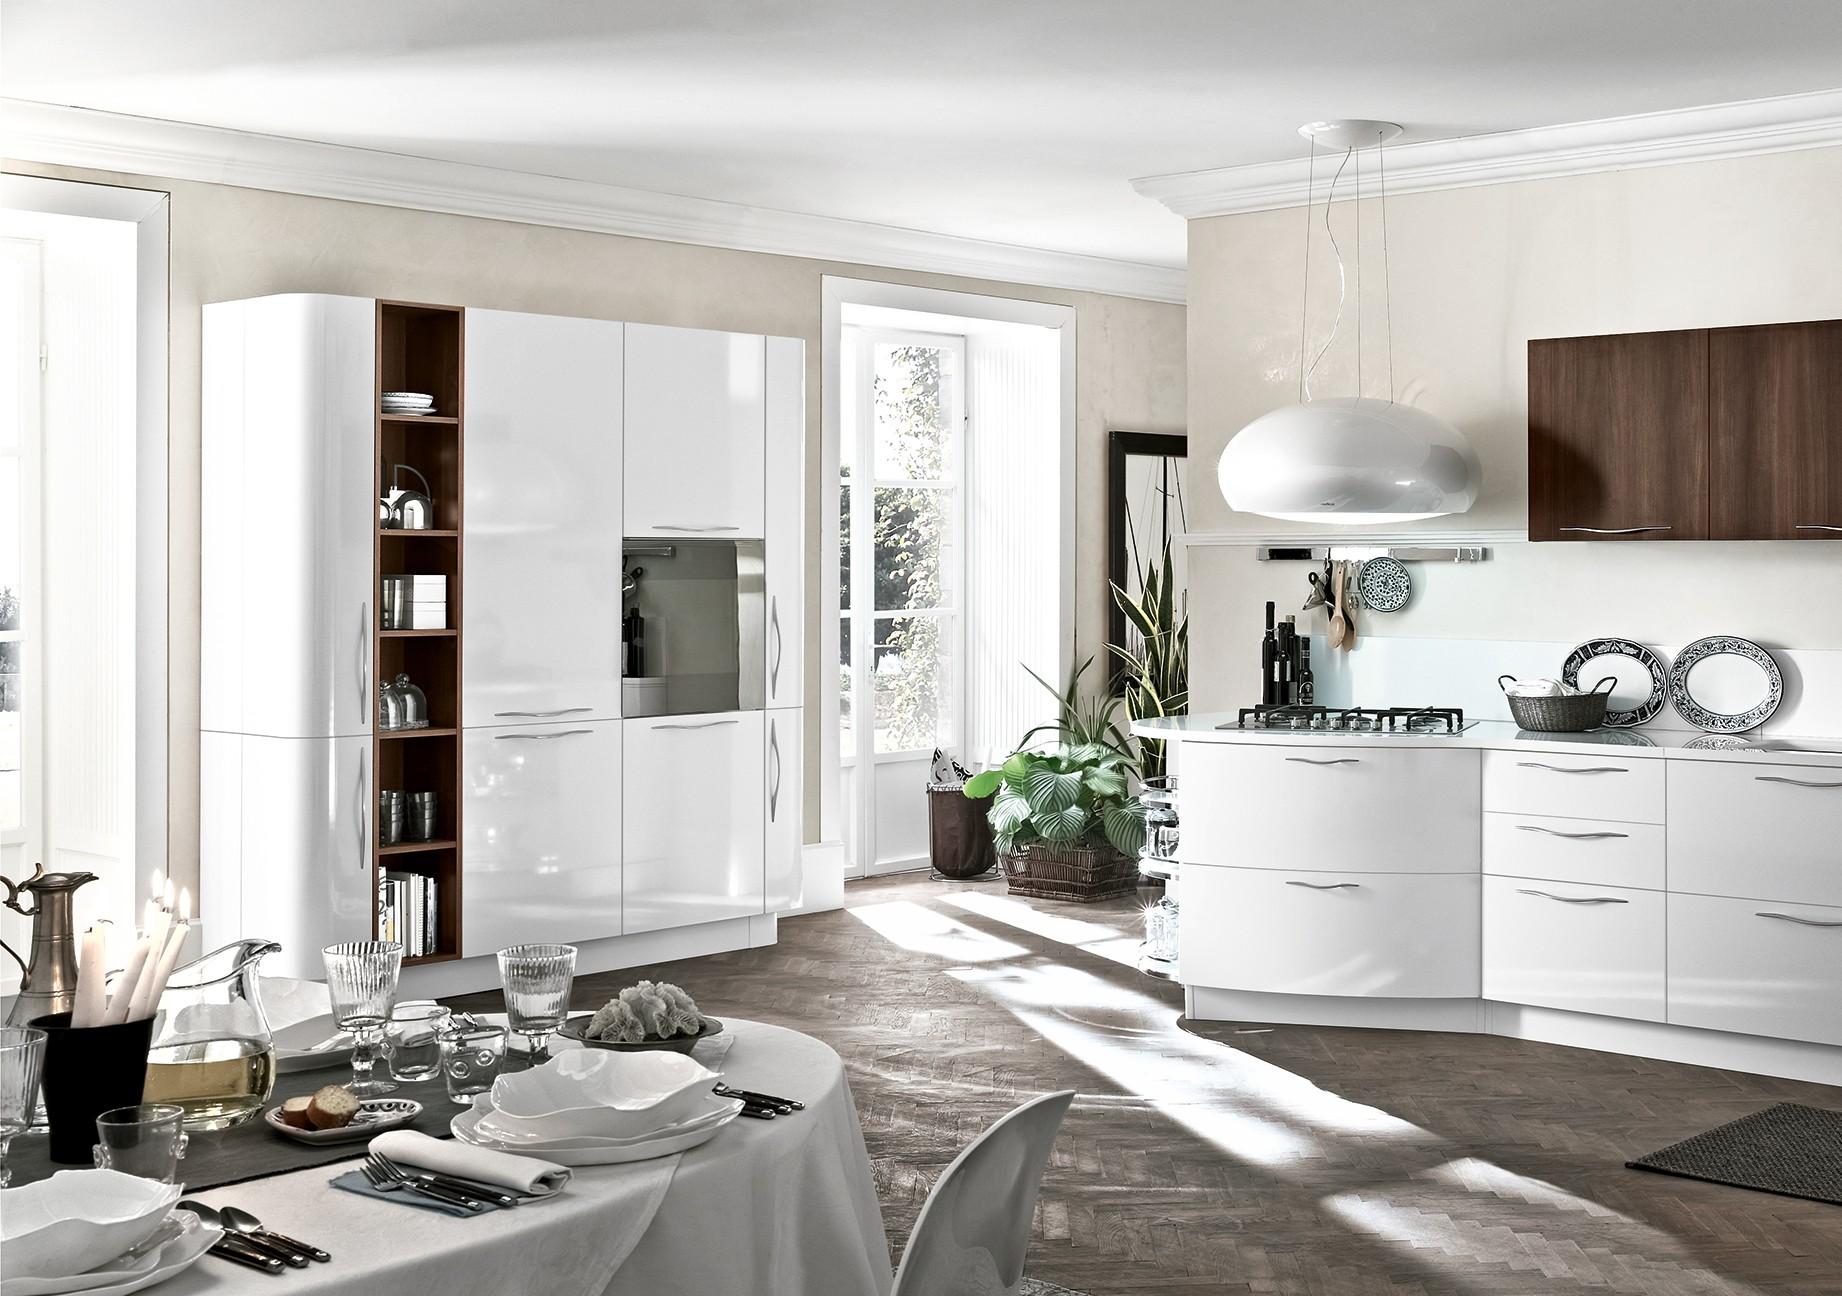 CATALOGO >> Cucine >> STOSA MAYA #5D4C40 1842 1296 Cucine Stosa Catalogo